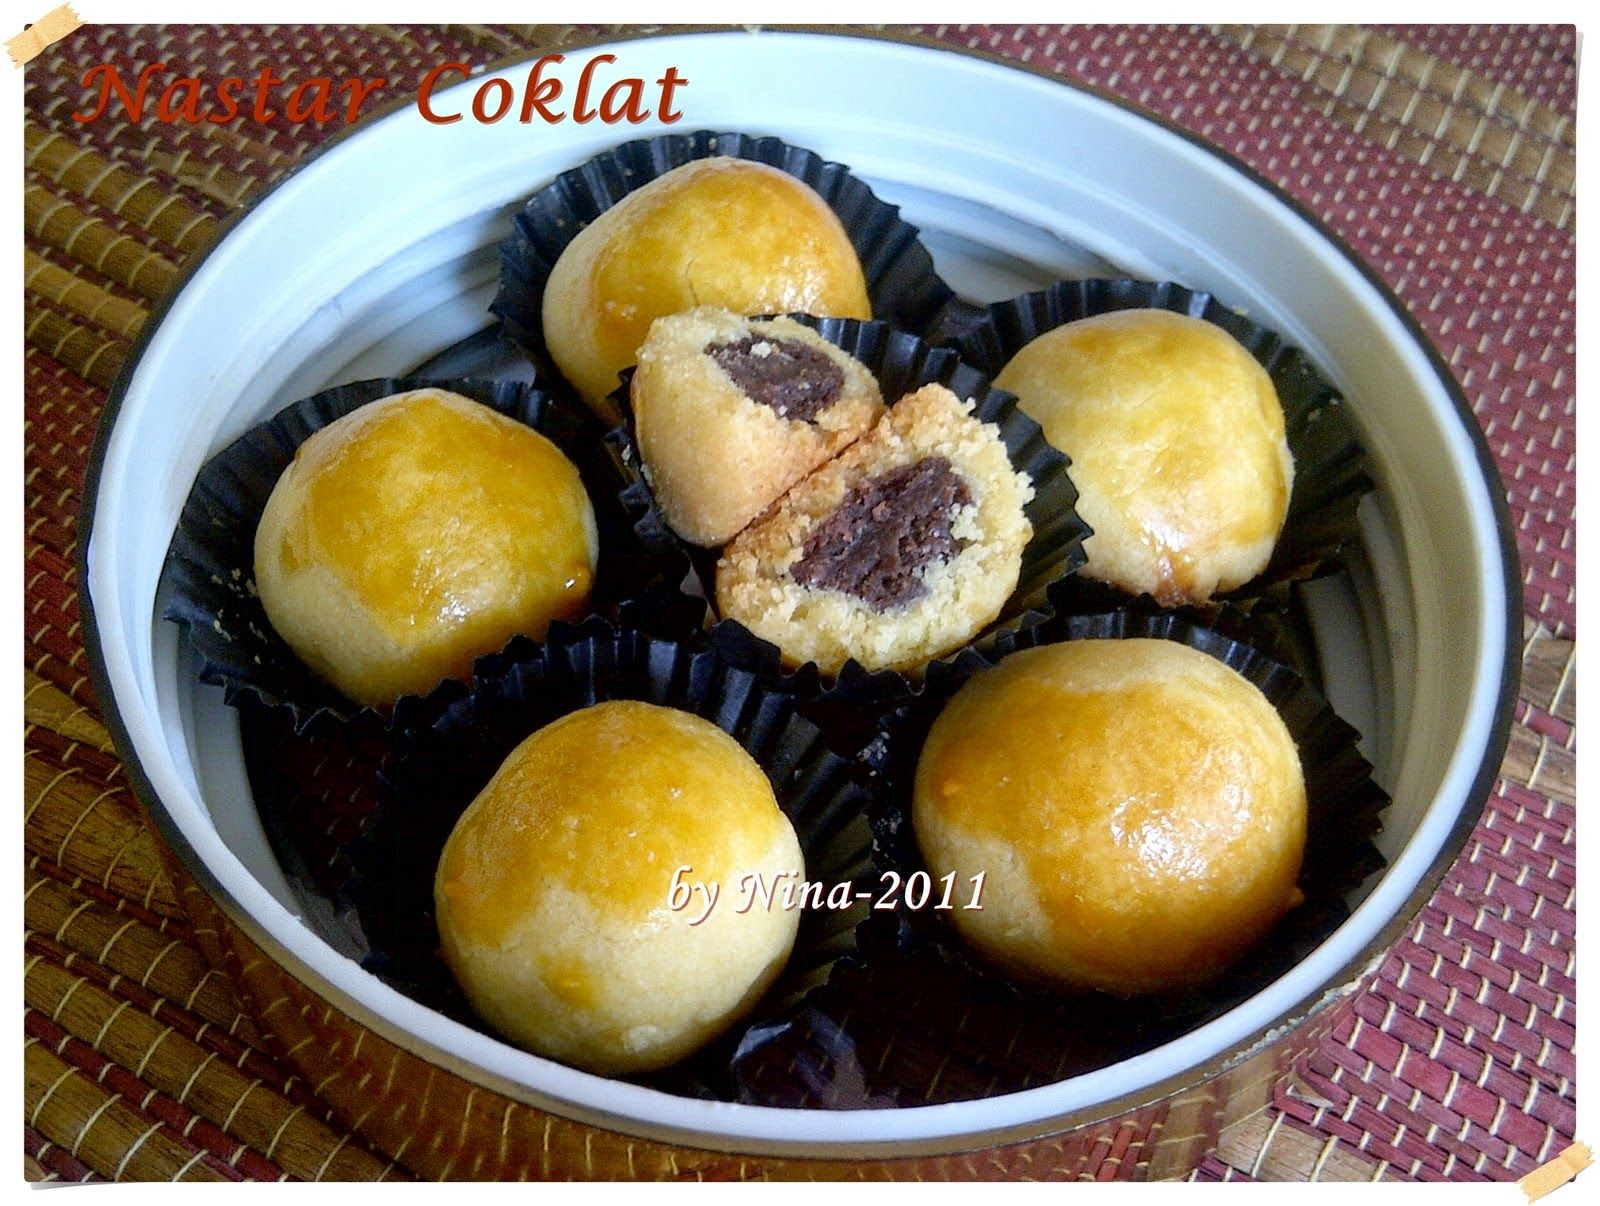 Resep Kue Kering Nastar Coklat Enak Dan Mudah Resep Kue Makanan Kue Kering